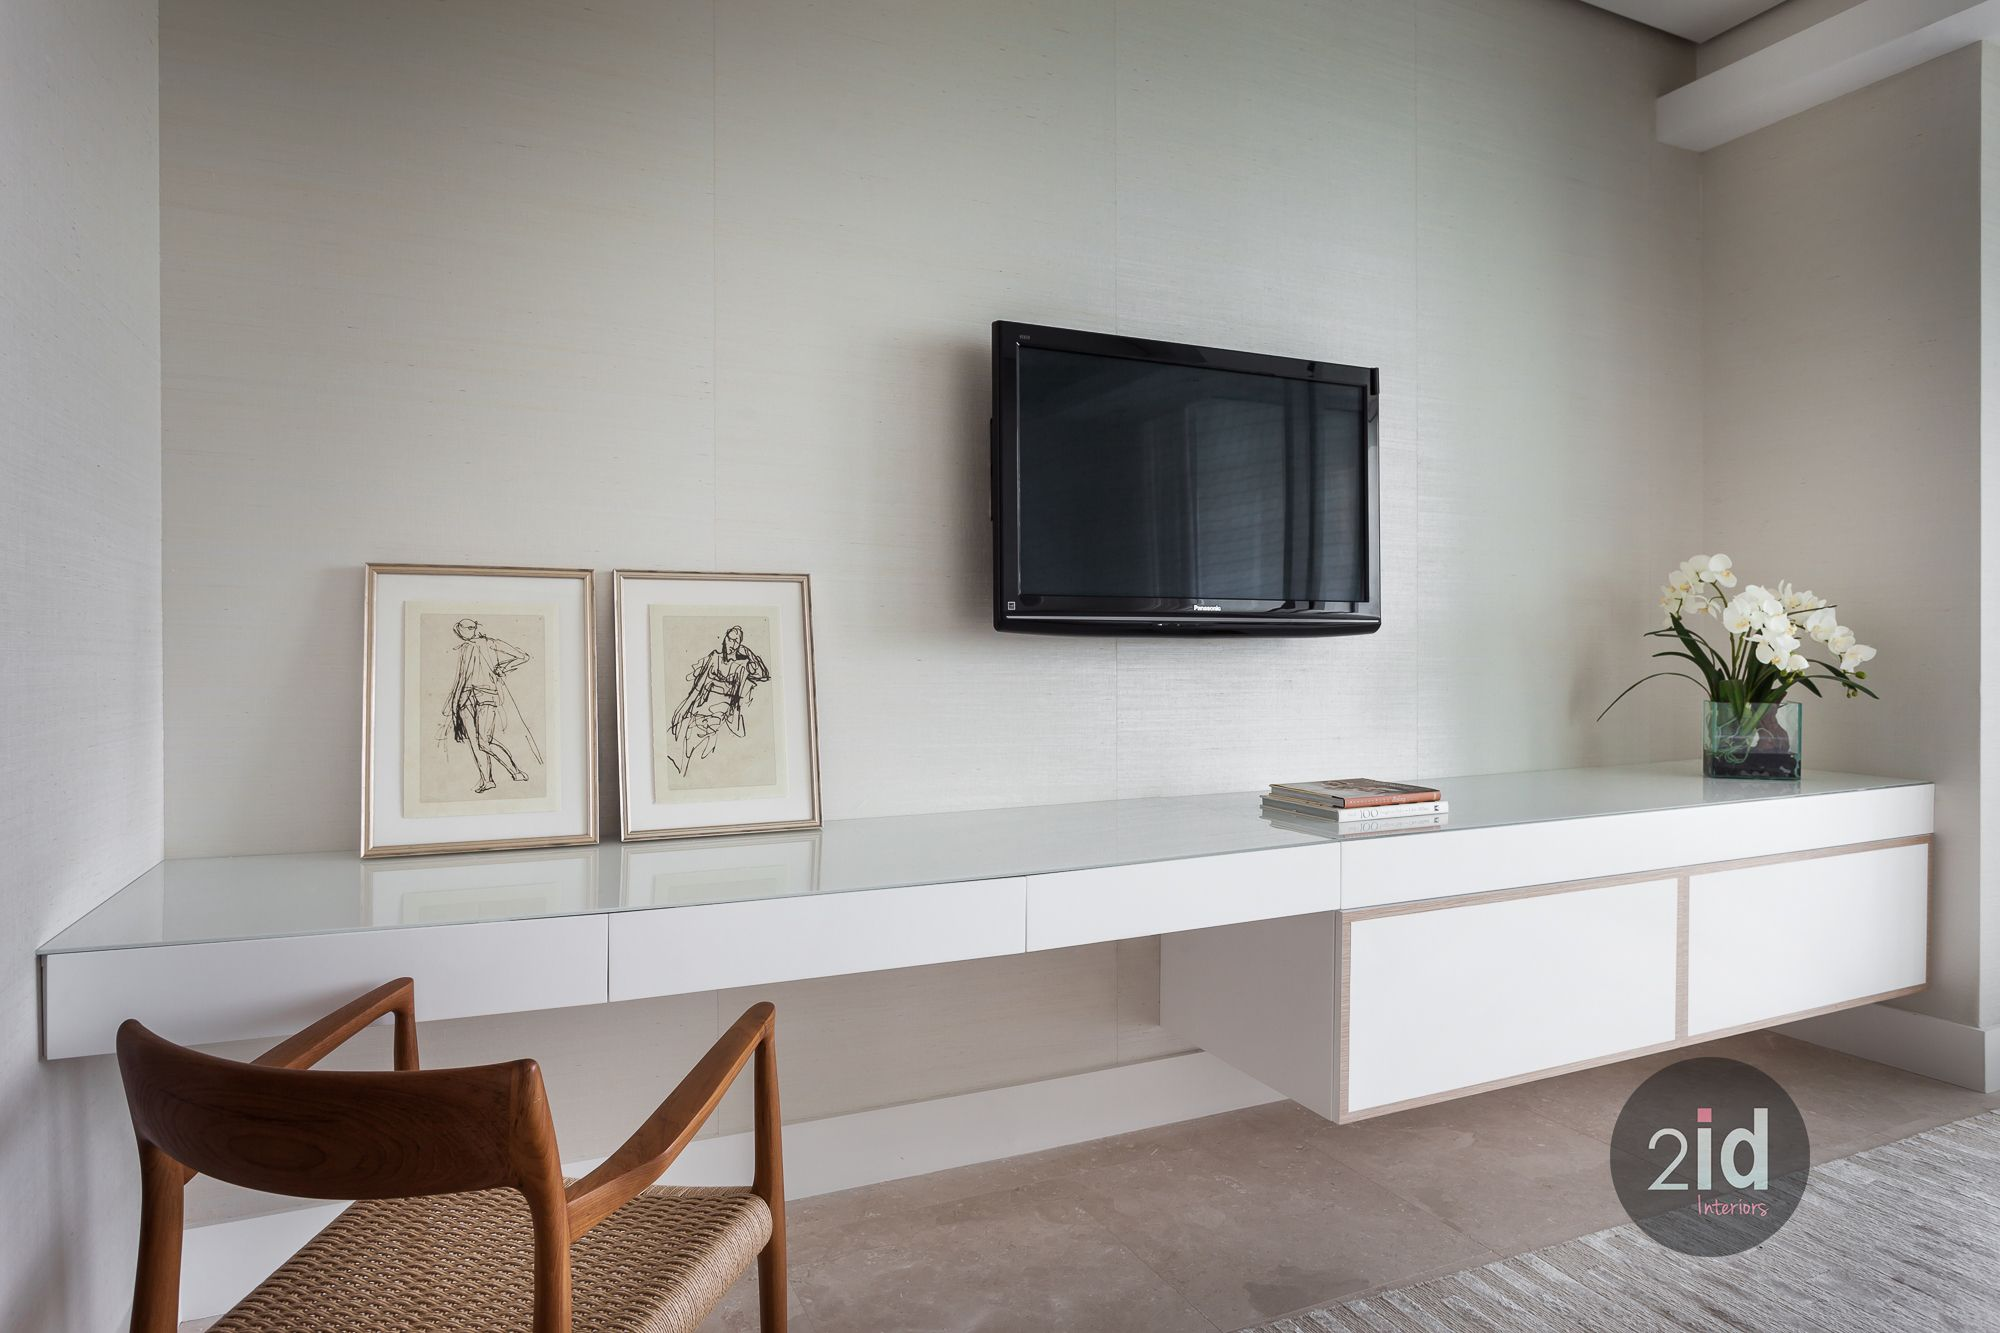 Floating Desk Tv Unit In Master Bedroom Idea Tv Unit Bedroom